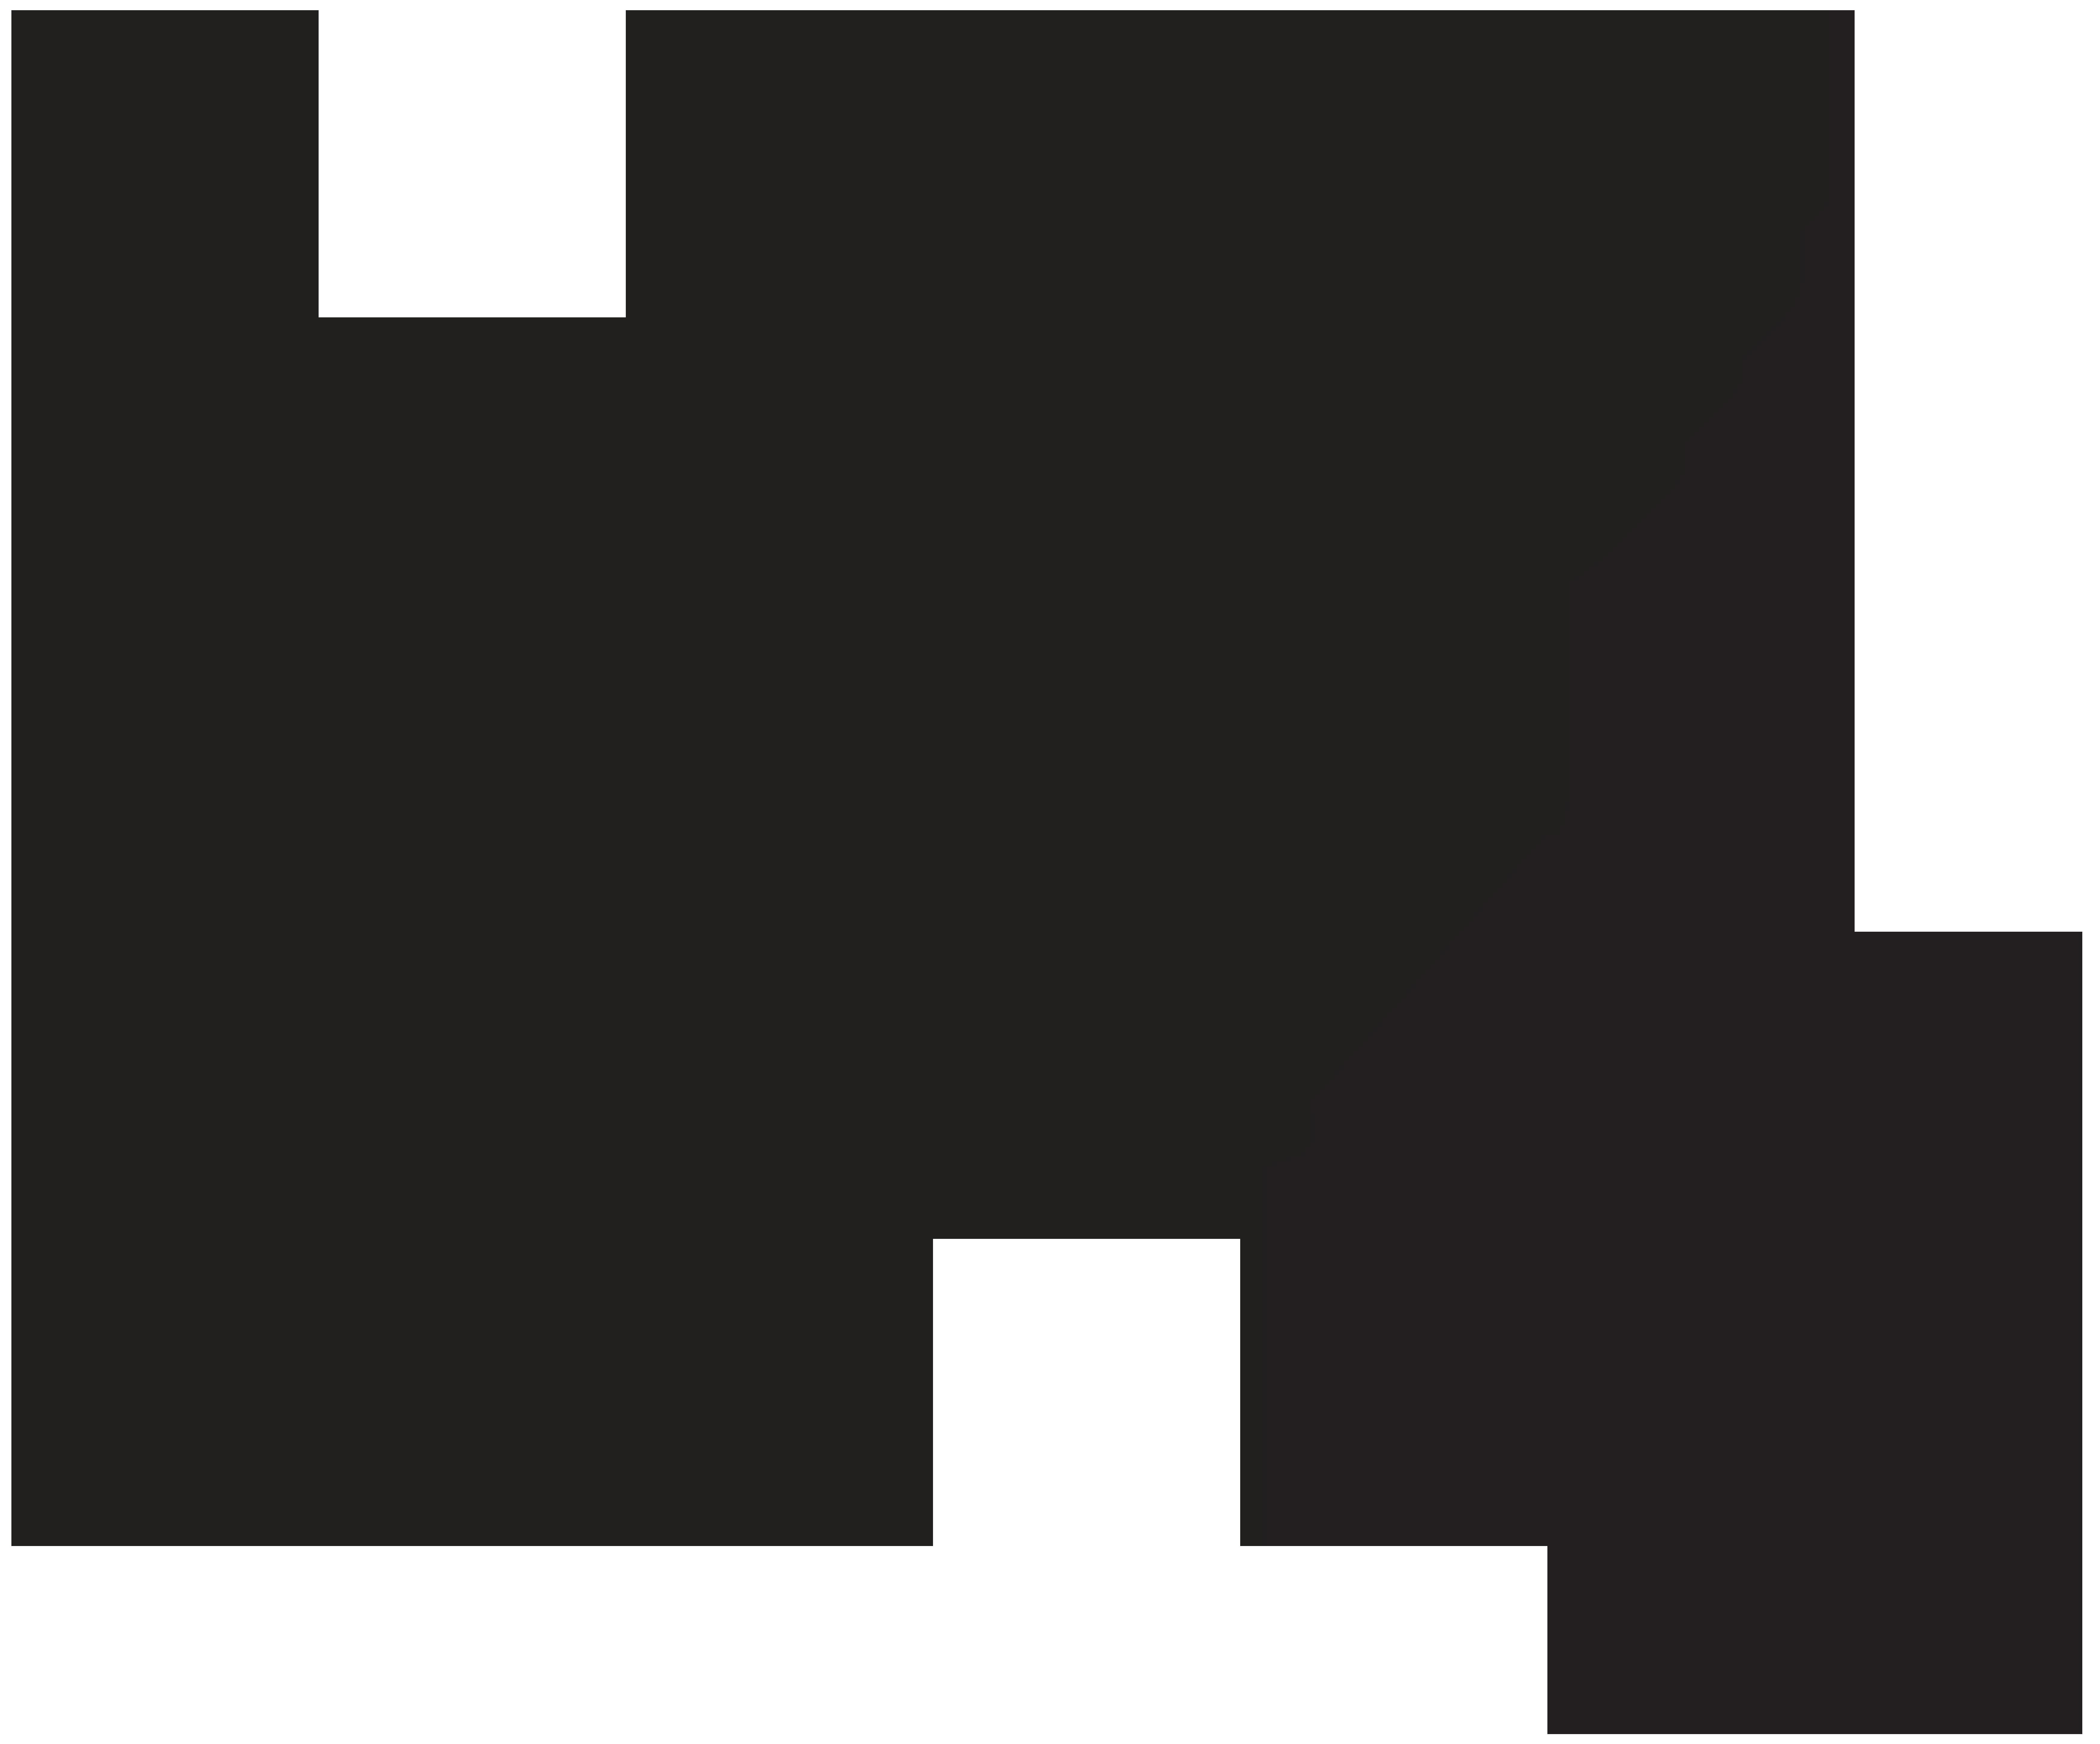 Cupid Transparent PNG Image.